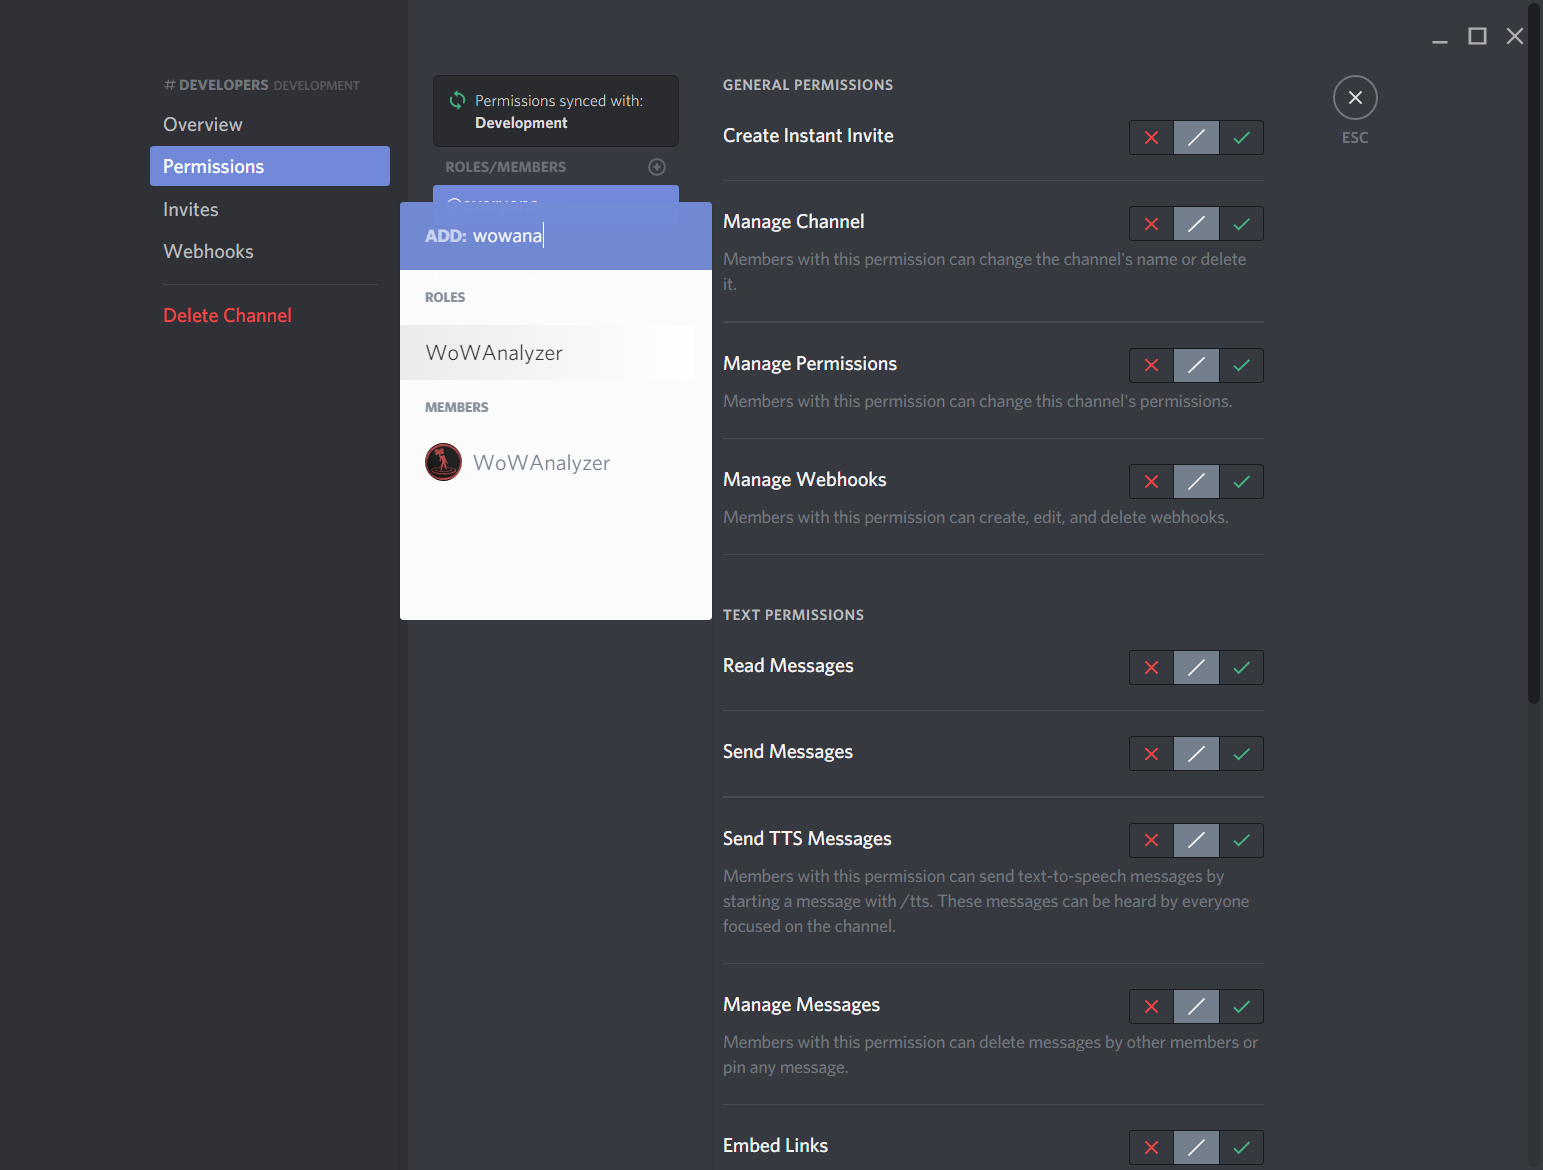 GitHub - WoWAnalyzer/DiscordBot: This Discord bot responds